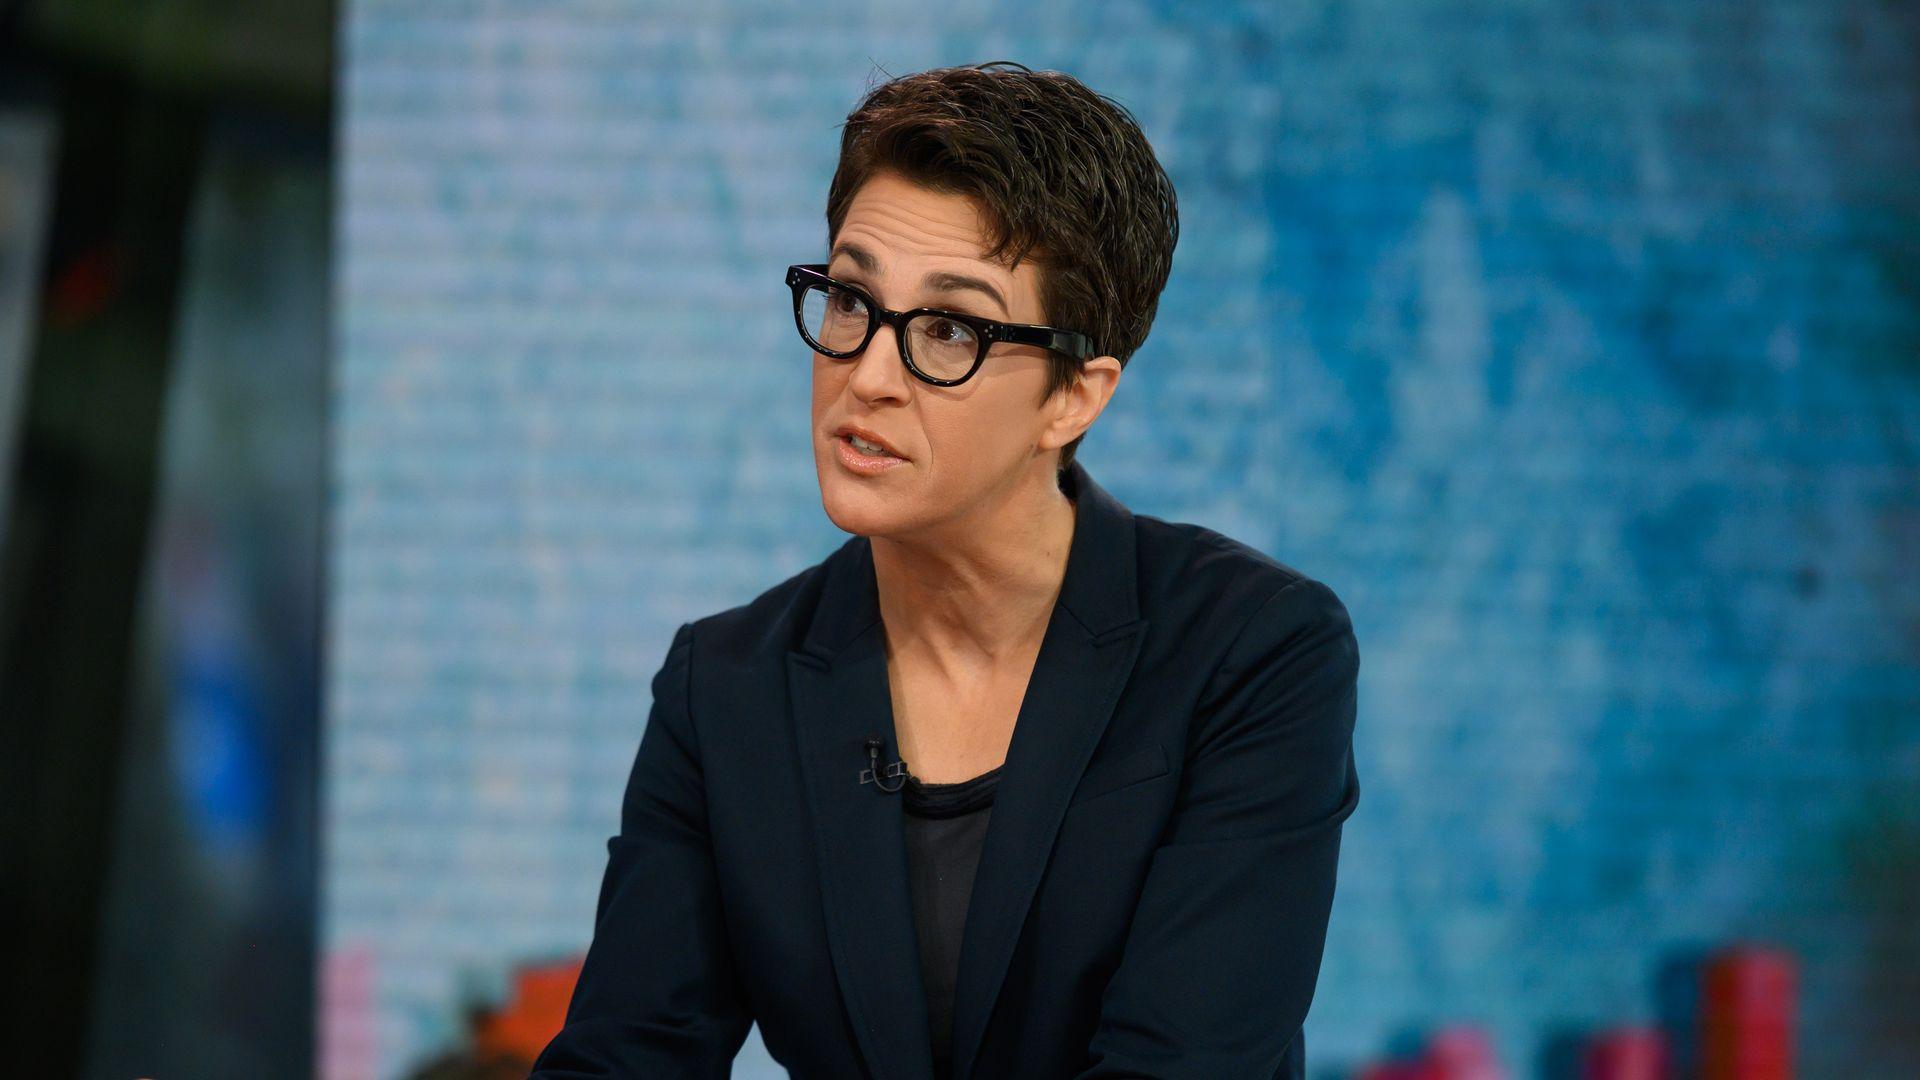 MSNBC Anchor Rachel Maddow